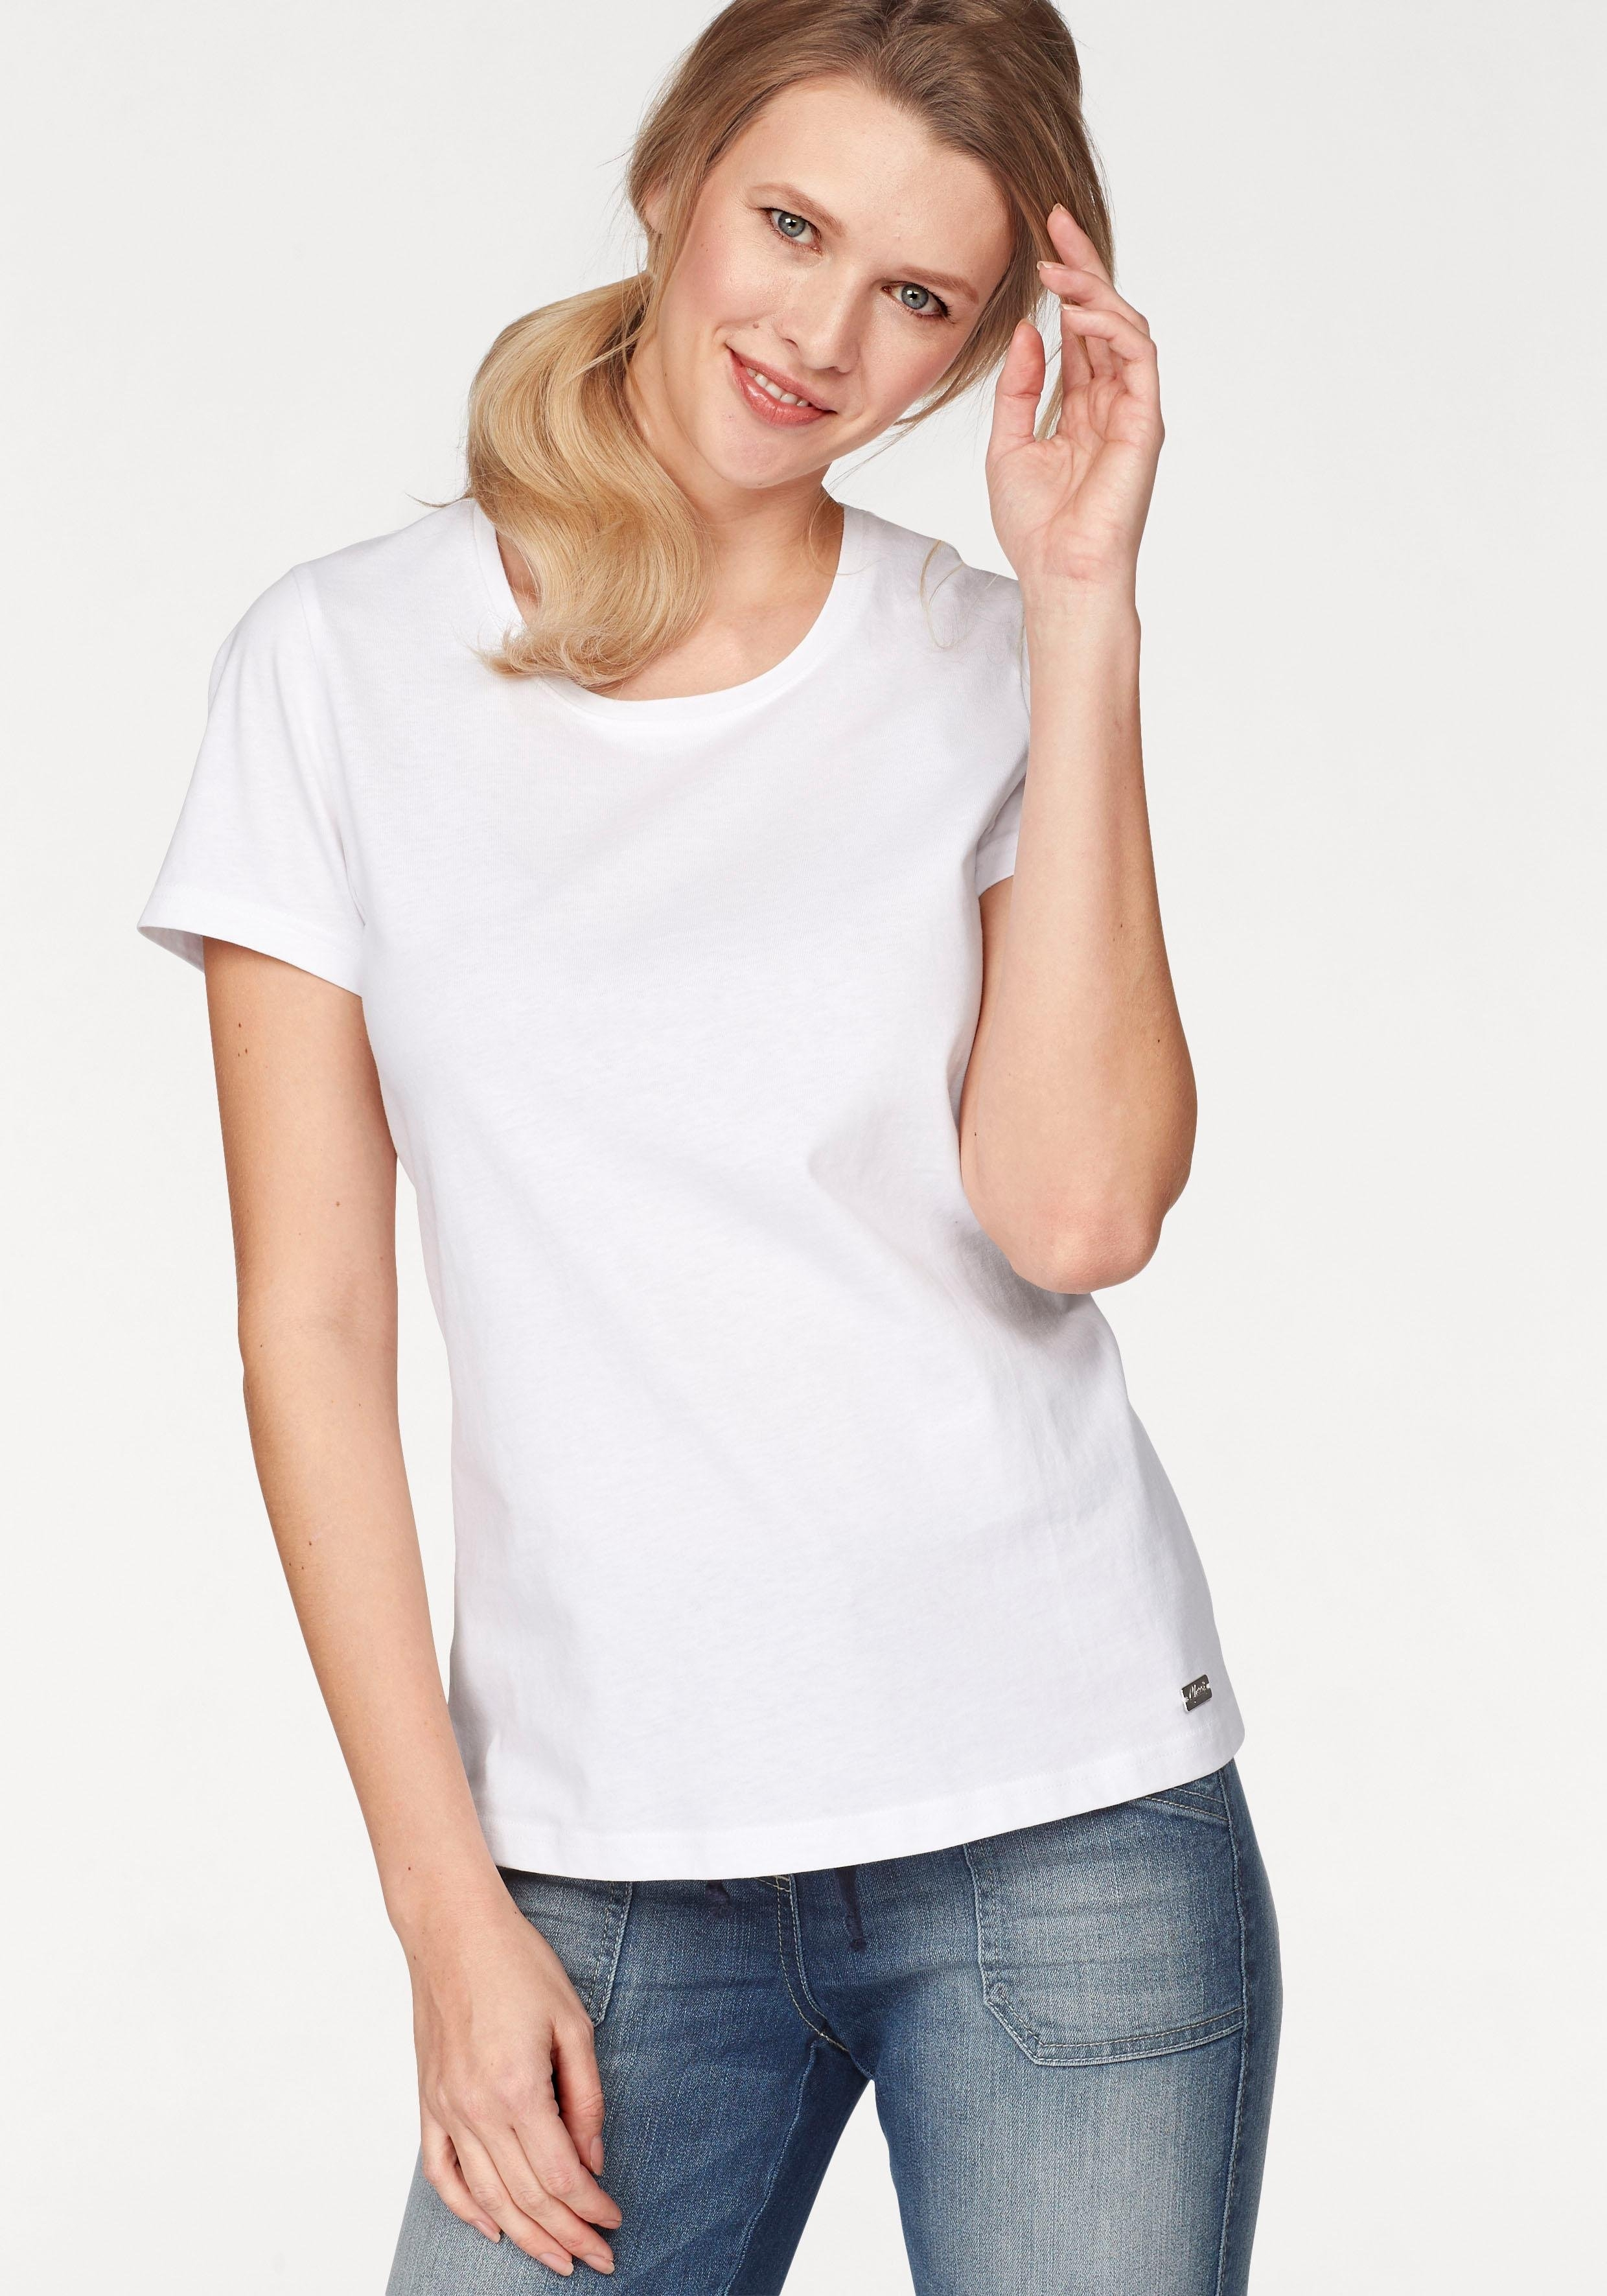 Cheer Cheer shirt T Online Online Bij shirt T dQeCoxWBr